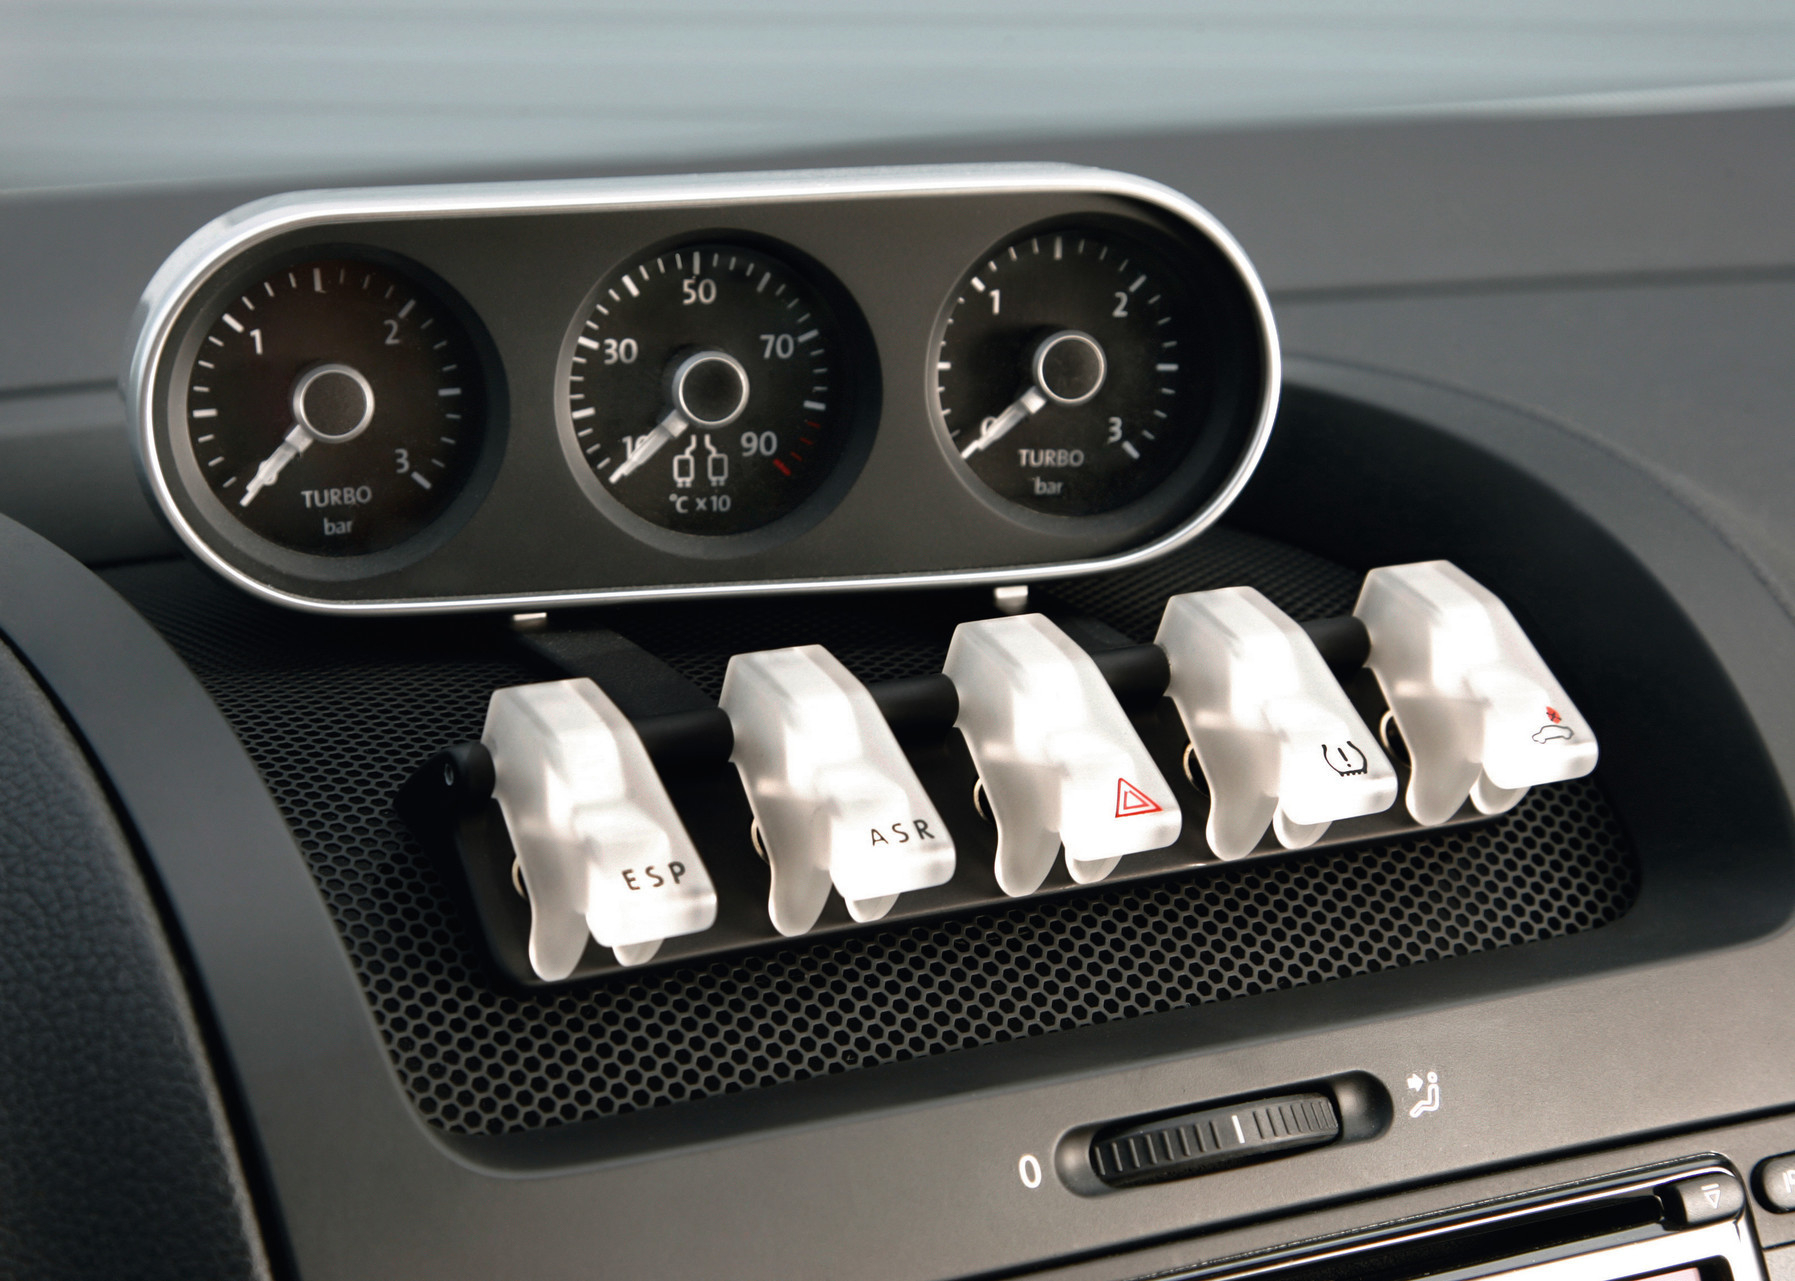 VW Golf GTI 650 - VW Golf GTI 650